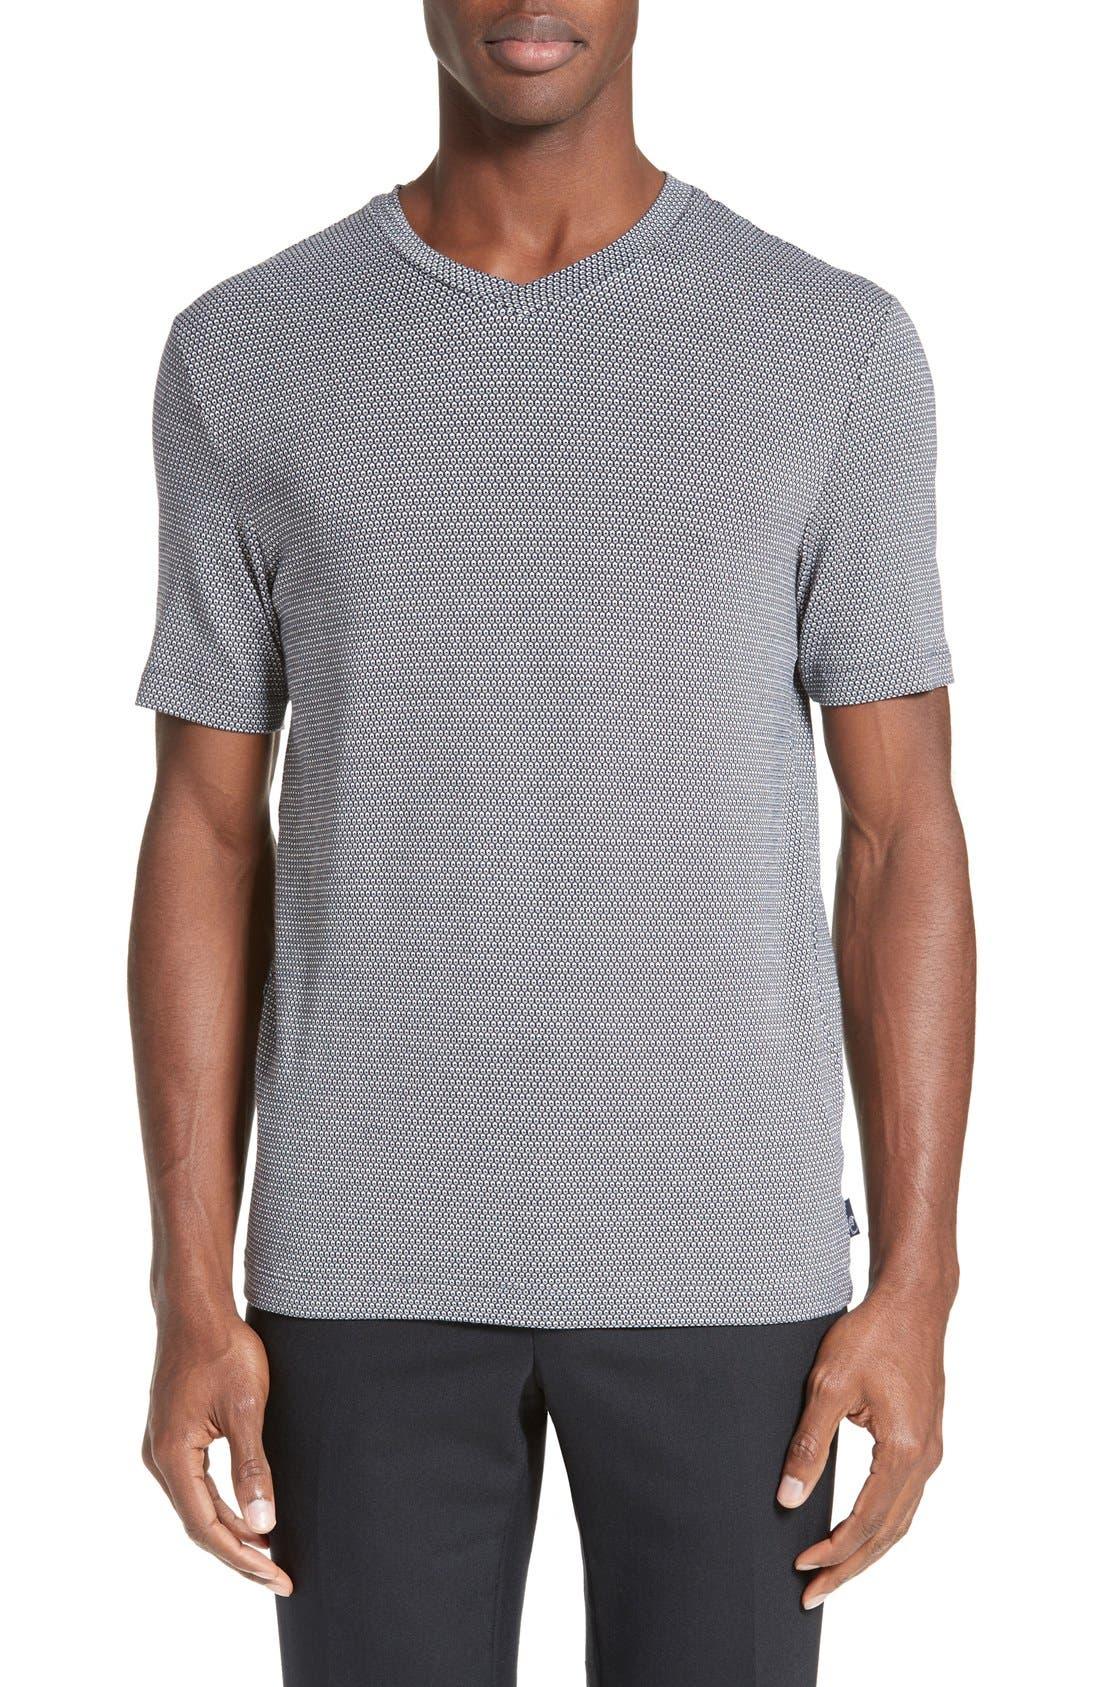 ARMANI COLLEZIONI Jacquard T-Shirt